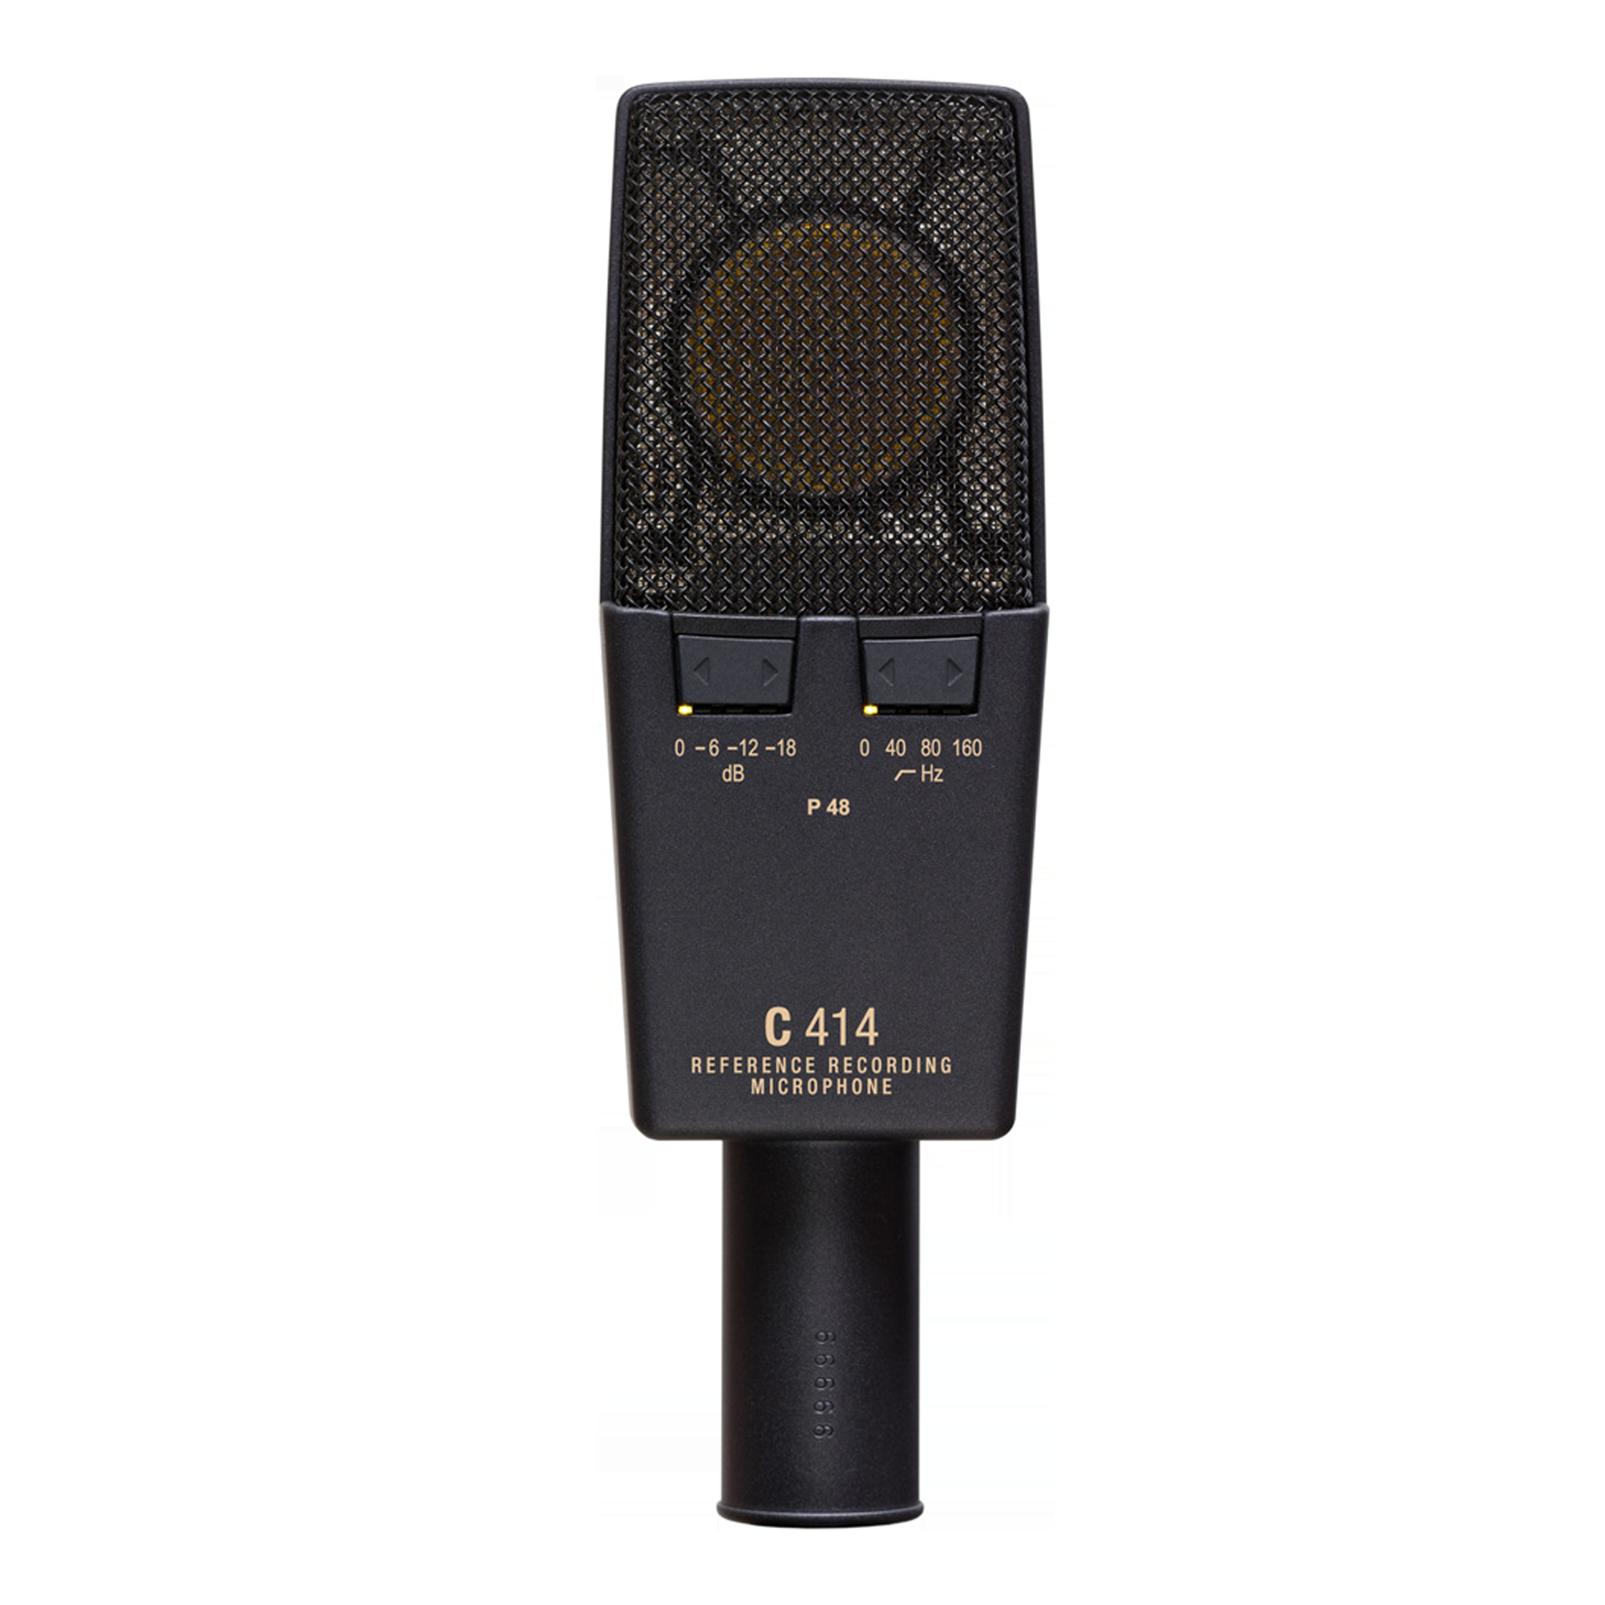 C414 XLII - Black - Reference multipattern condenser microphone - Back